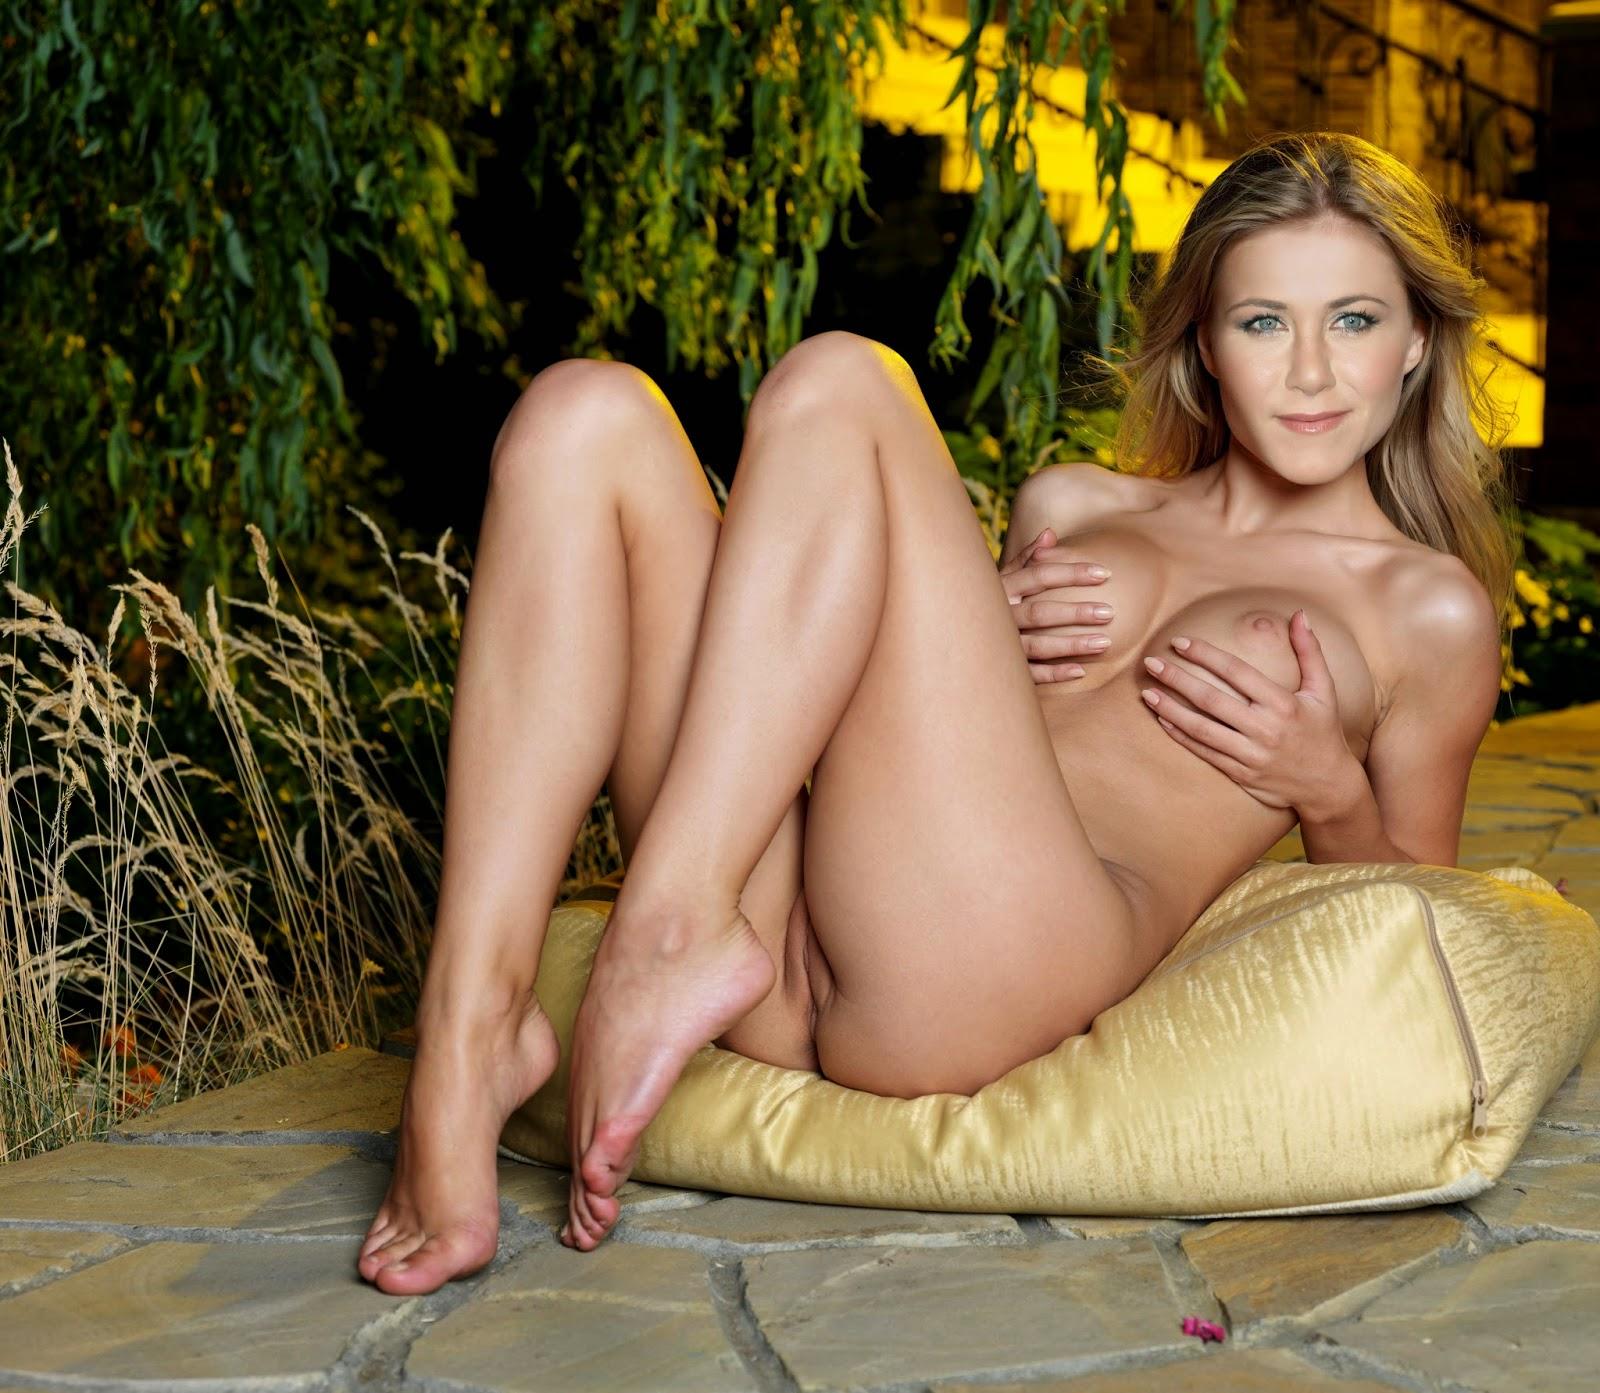 Naughty Sex Games Online  C2 B7 Jennifer Aniston